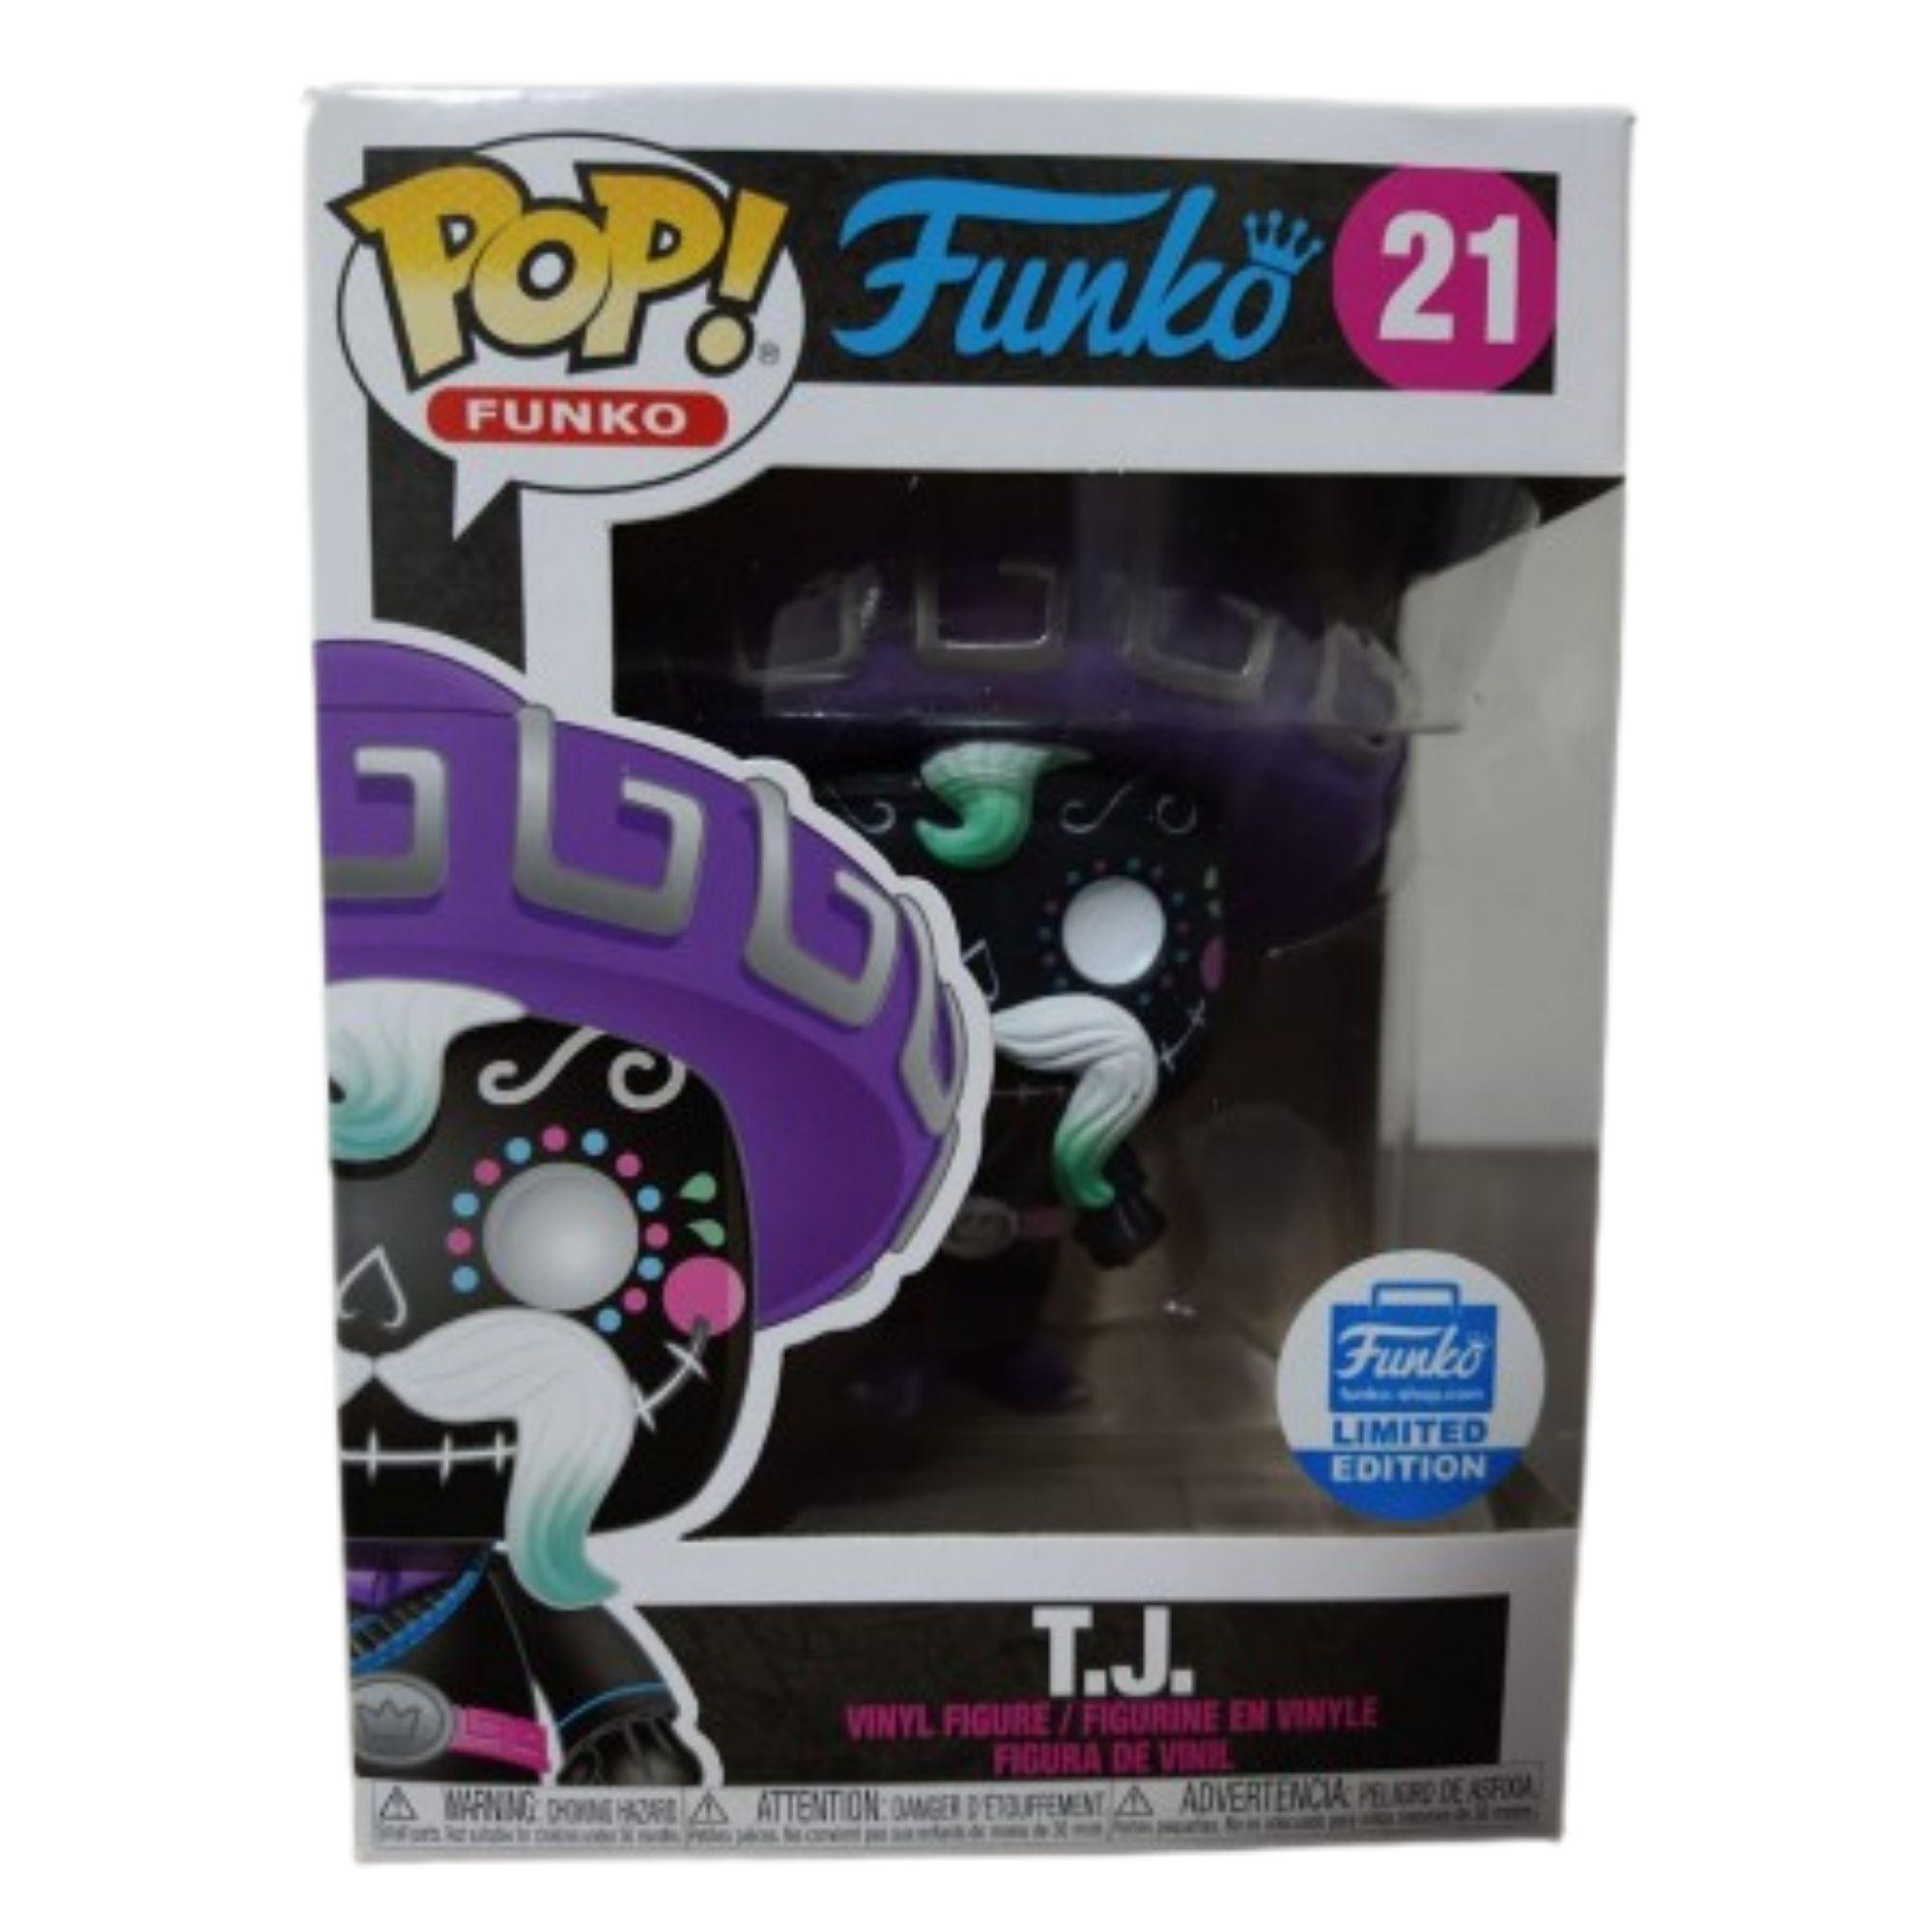 Funko Pop T.J.  Fantastik Plastik #21  - Game Land Brinquedos